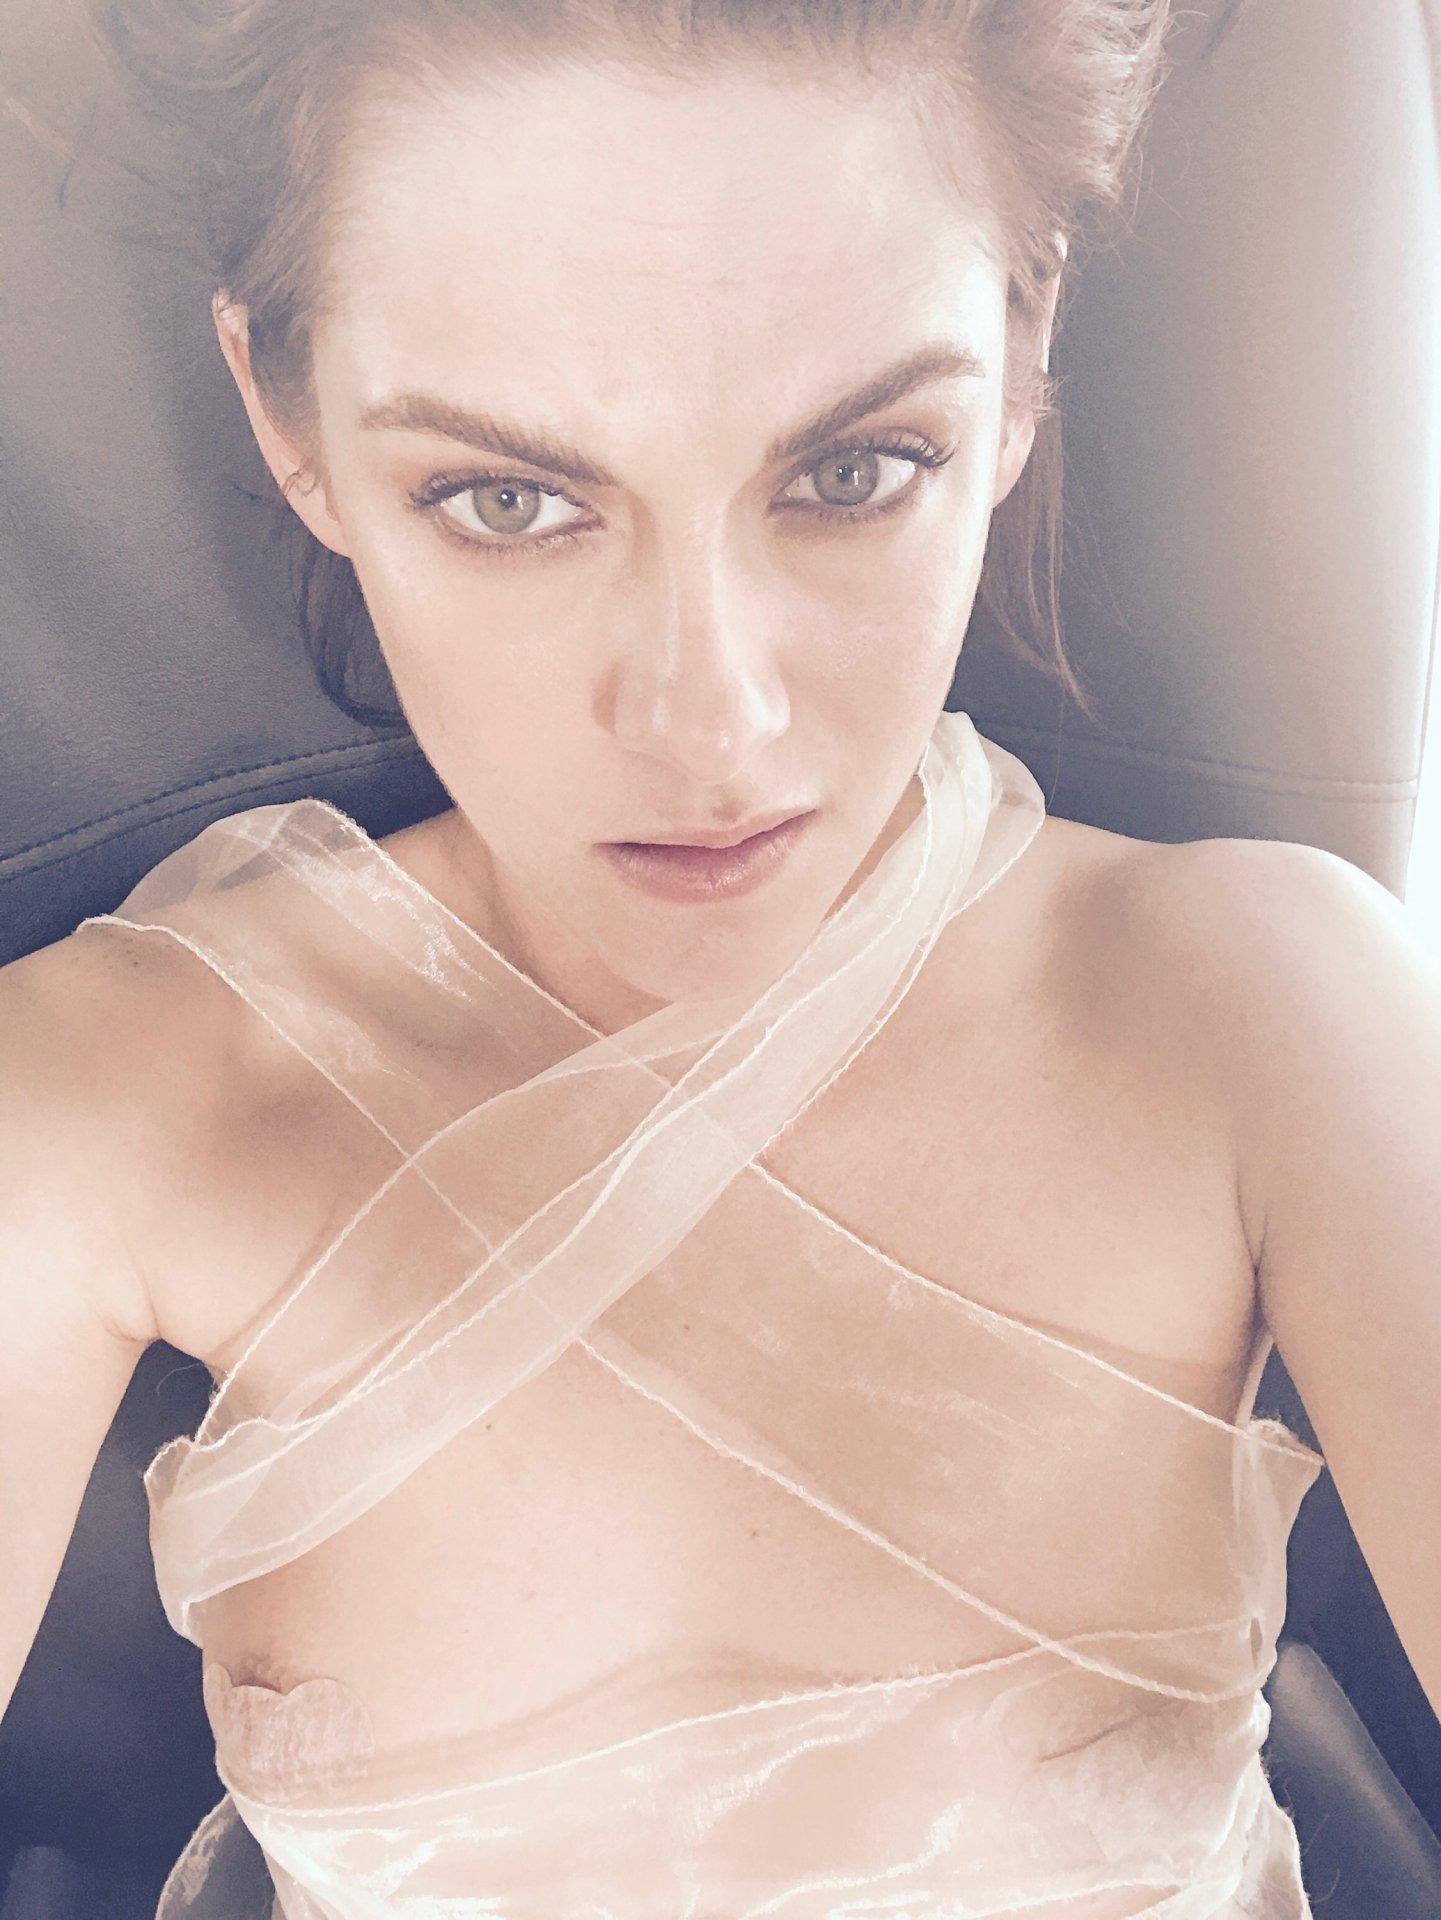 Kristen stewart leaked nude photos